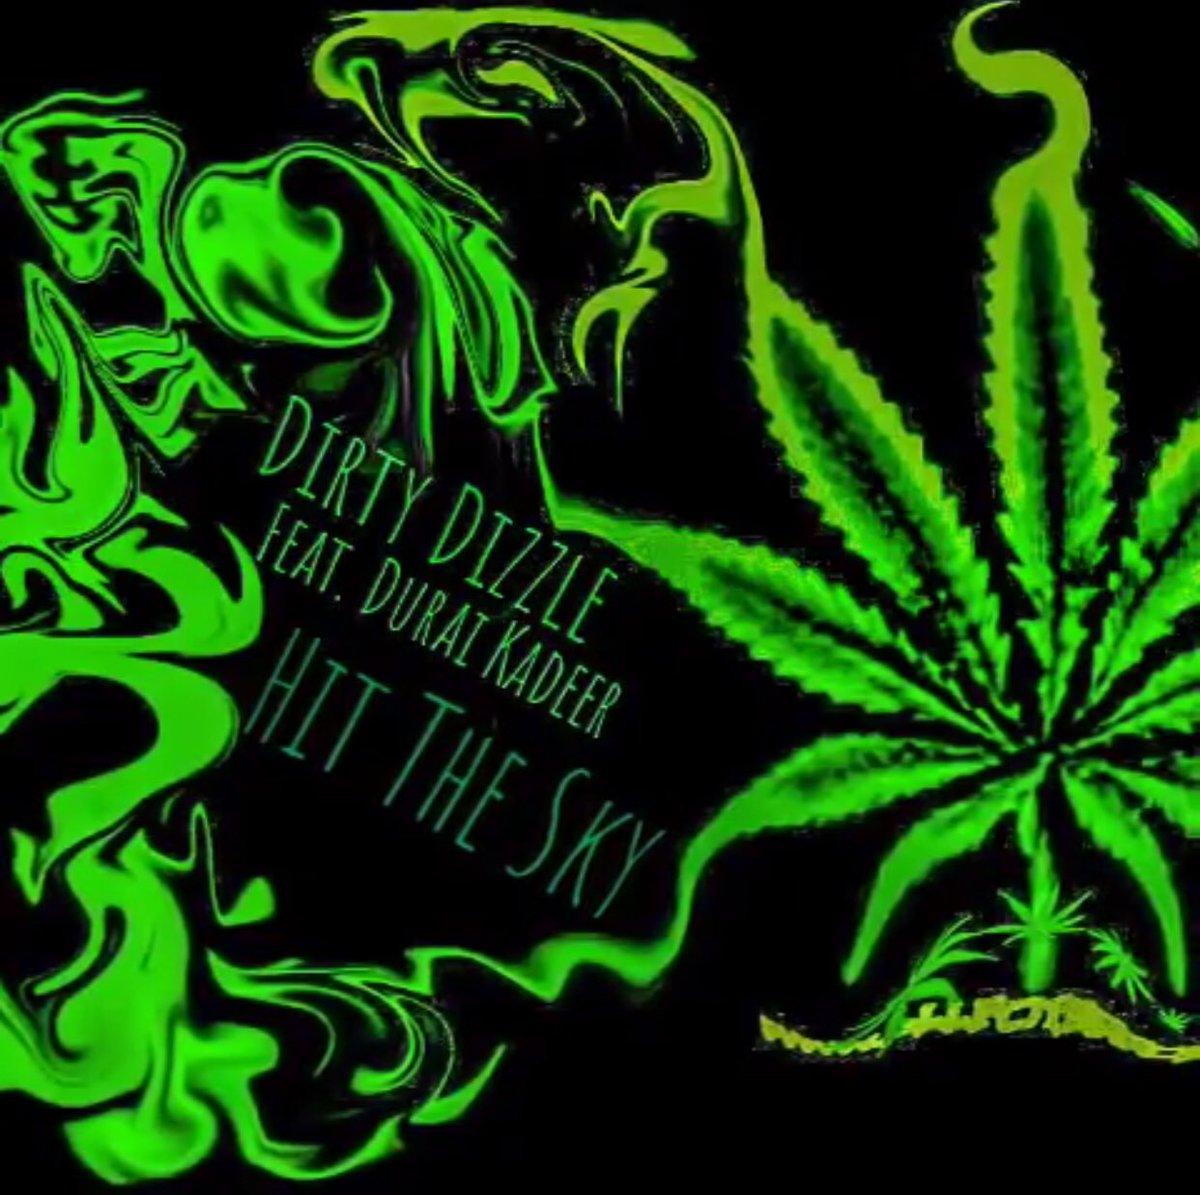 "LYRIC VIDEO FOR ""Hit The Sky"" by Dirty Dizzle feat. Durai Kadeer #retweet #like #twodopemusic #hitthesky #like4like #likeforlike #followforfollow #follow #follow4follow #youtube   https://www. youtube.com/watch?v=iMeSL9 t_--I &nbsp; … <br>http://pic.twitter.com/6rkw0s3Tb1"